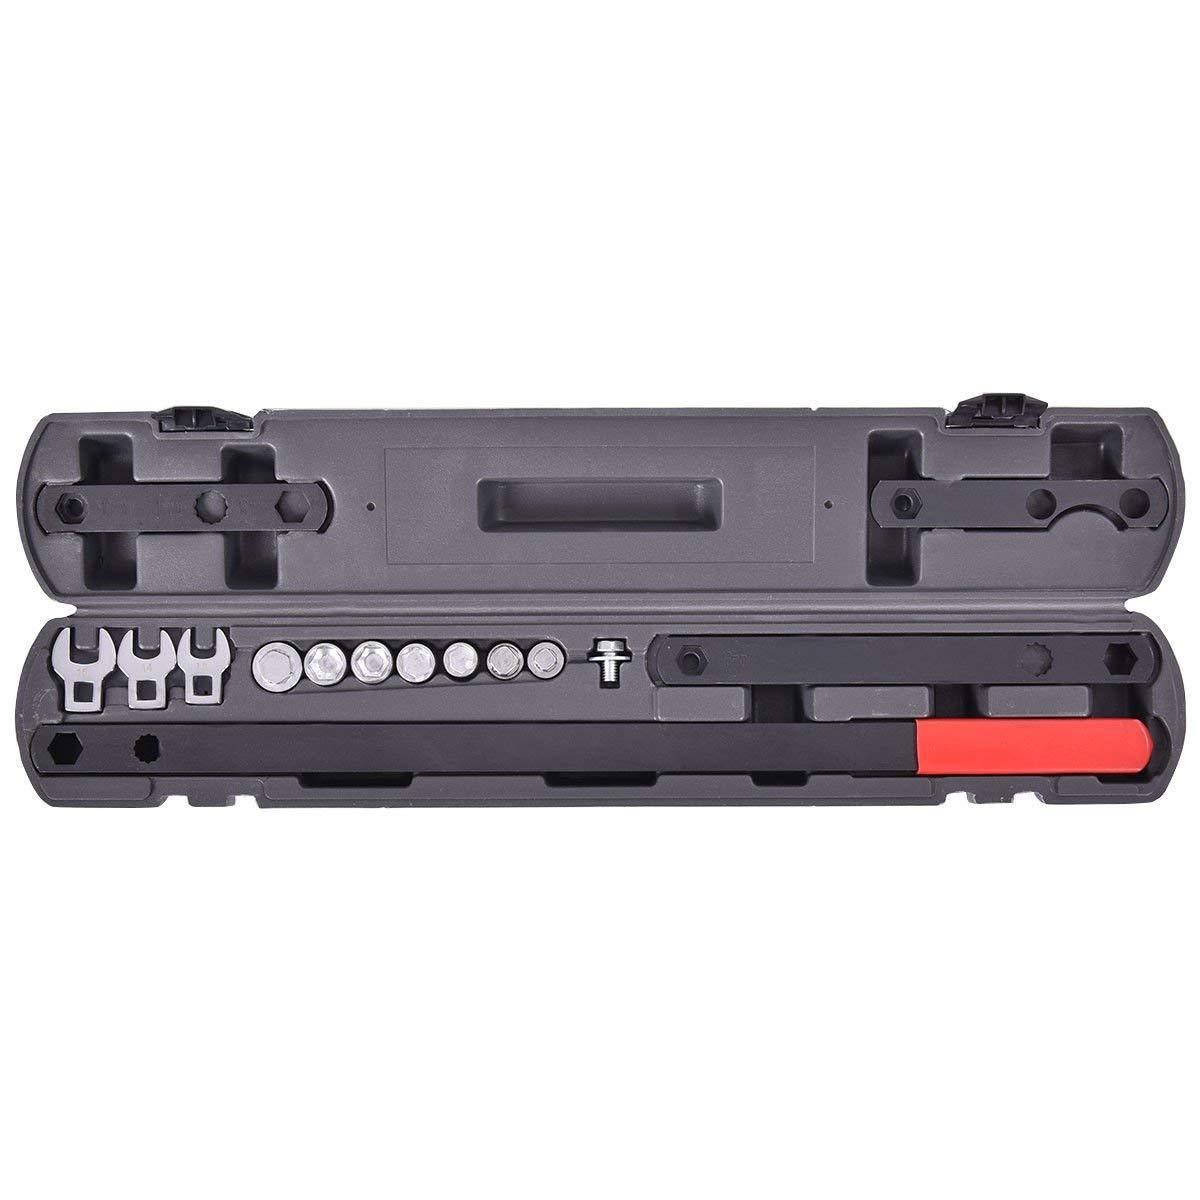 CHOOSEandBUY 16 pcs Wrench Serpentine Belt Tool Kit Automotive Repair Set Sockets